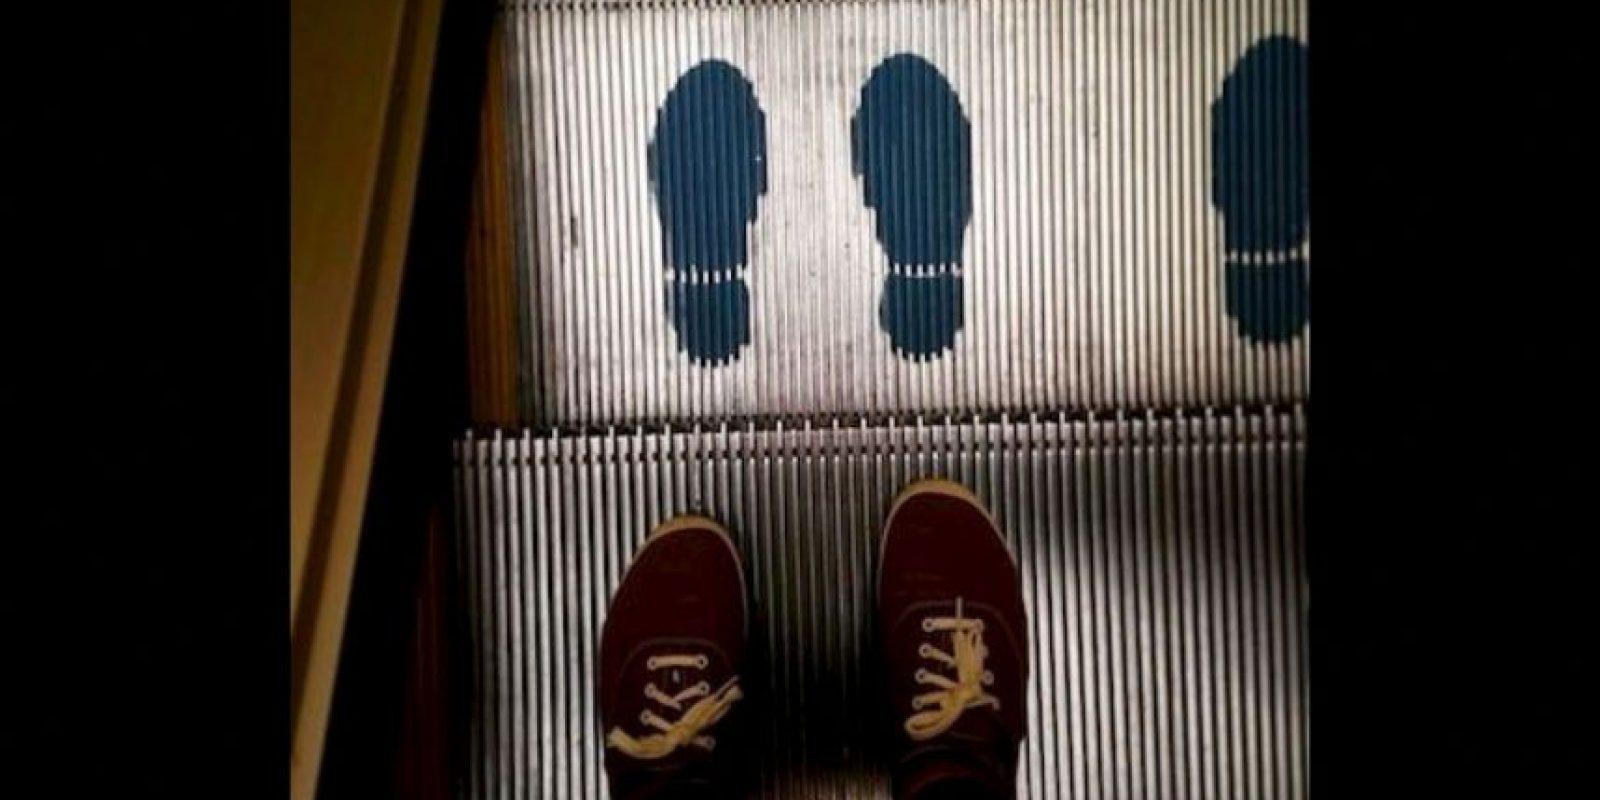 No usar estas escaleras en estado de embriaguez Foto:Instagram.com/explore/tags/escalator/